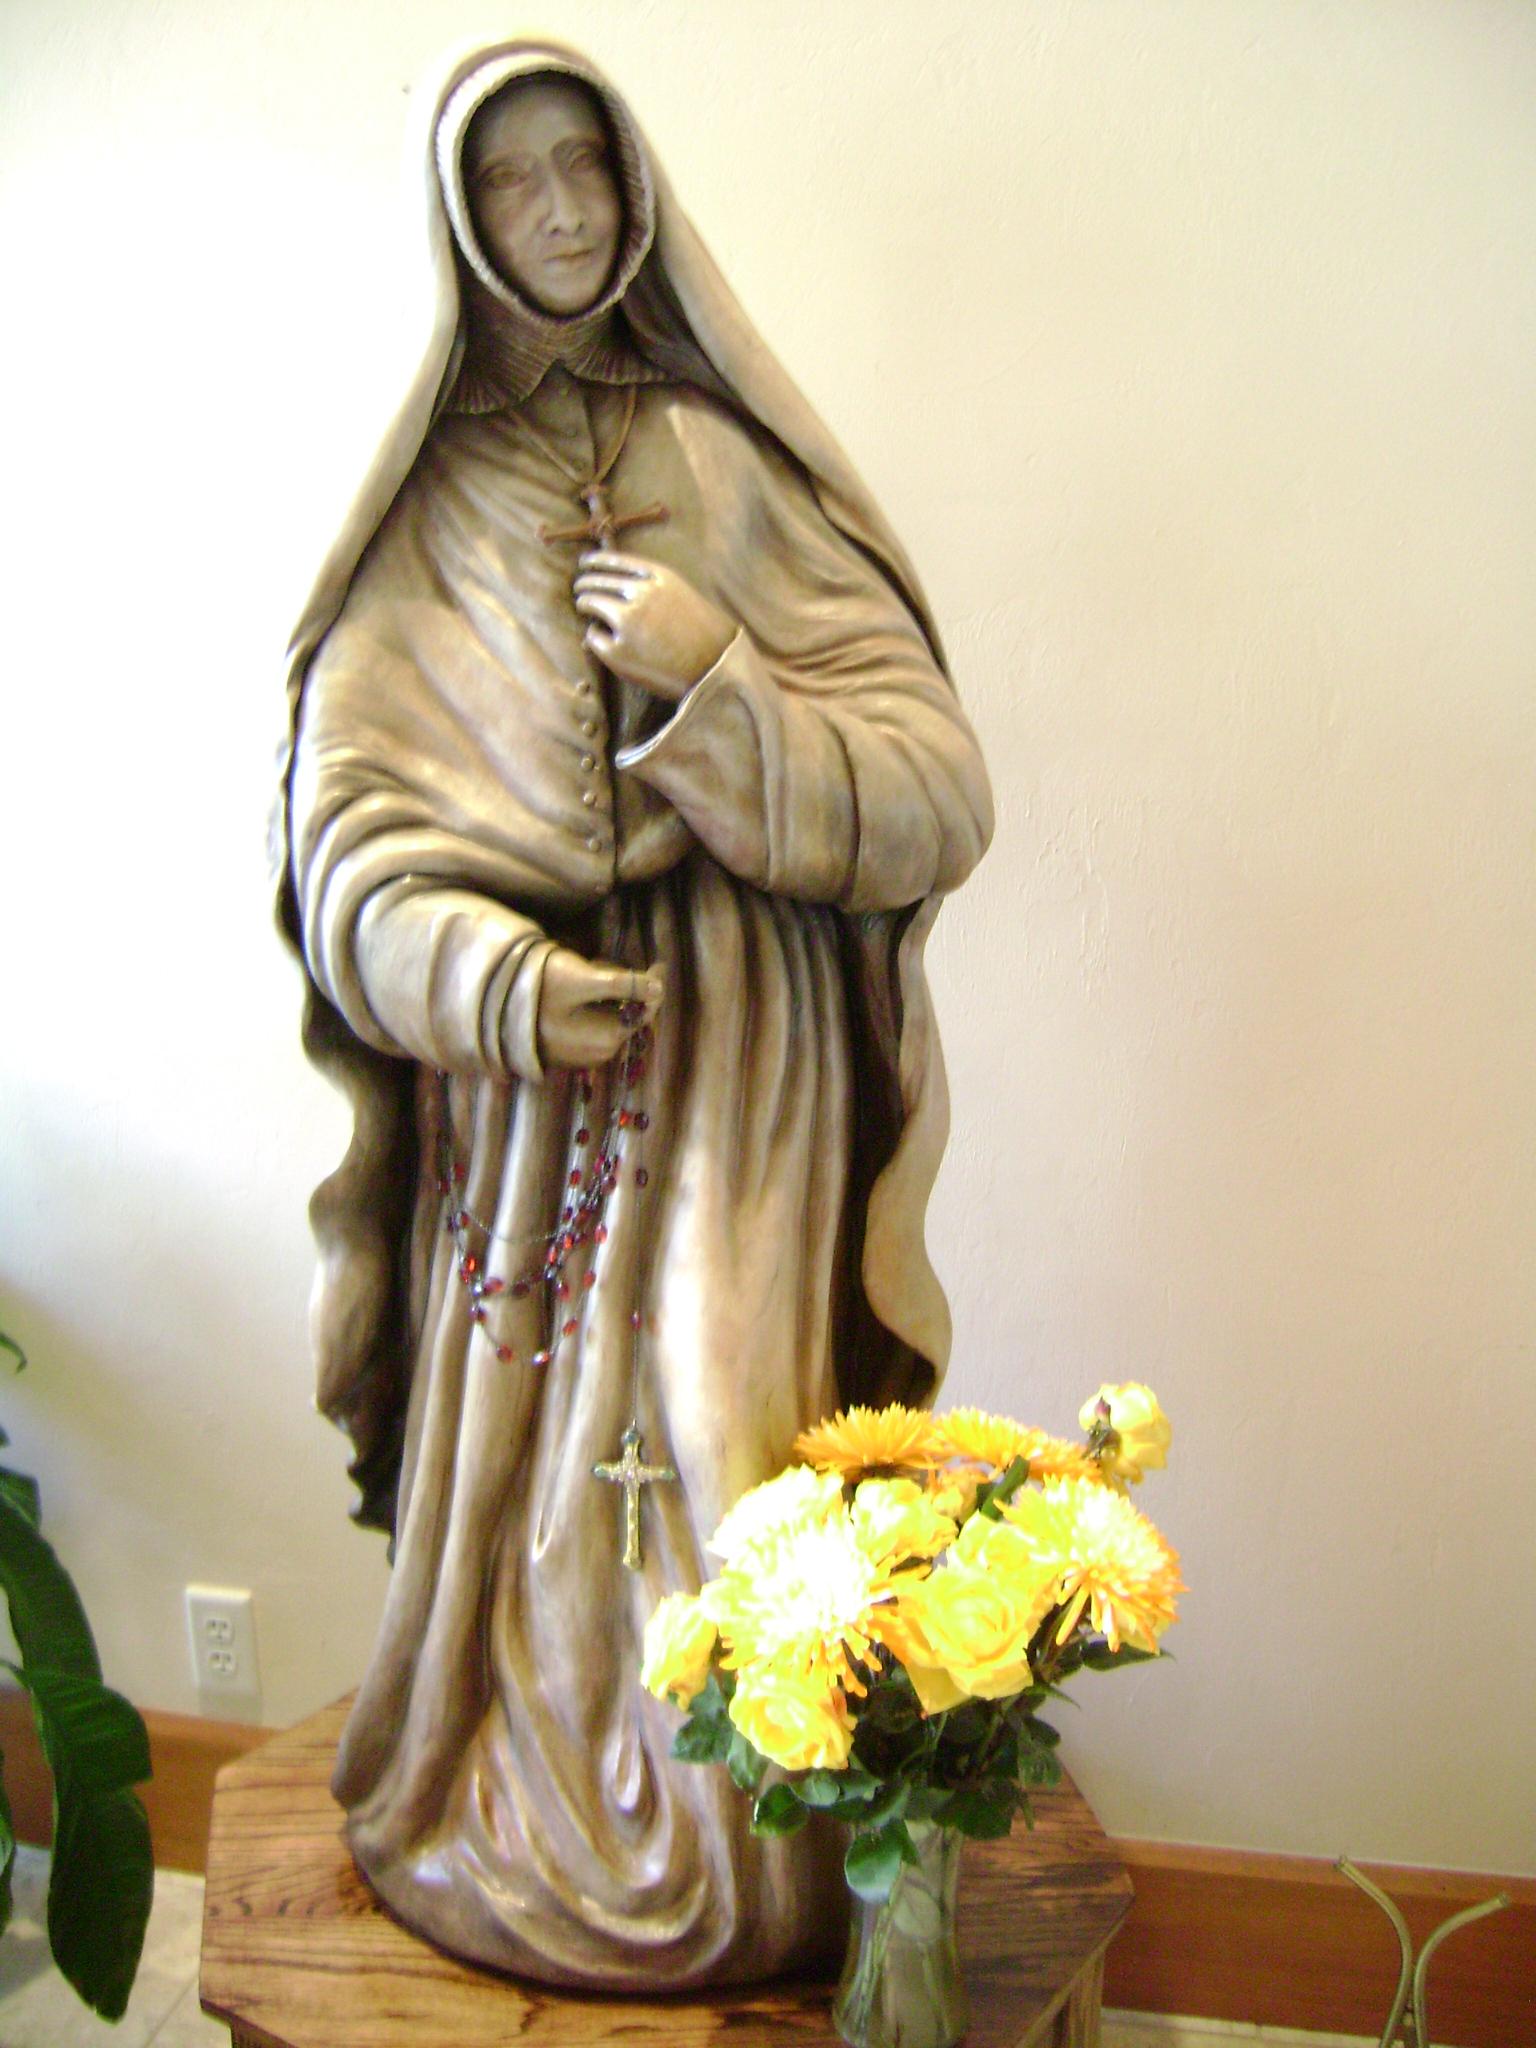 patron saint